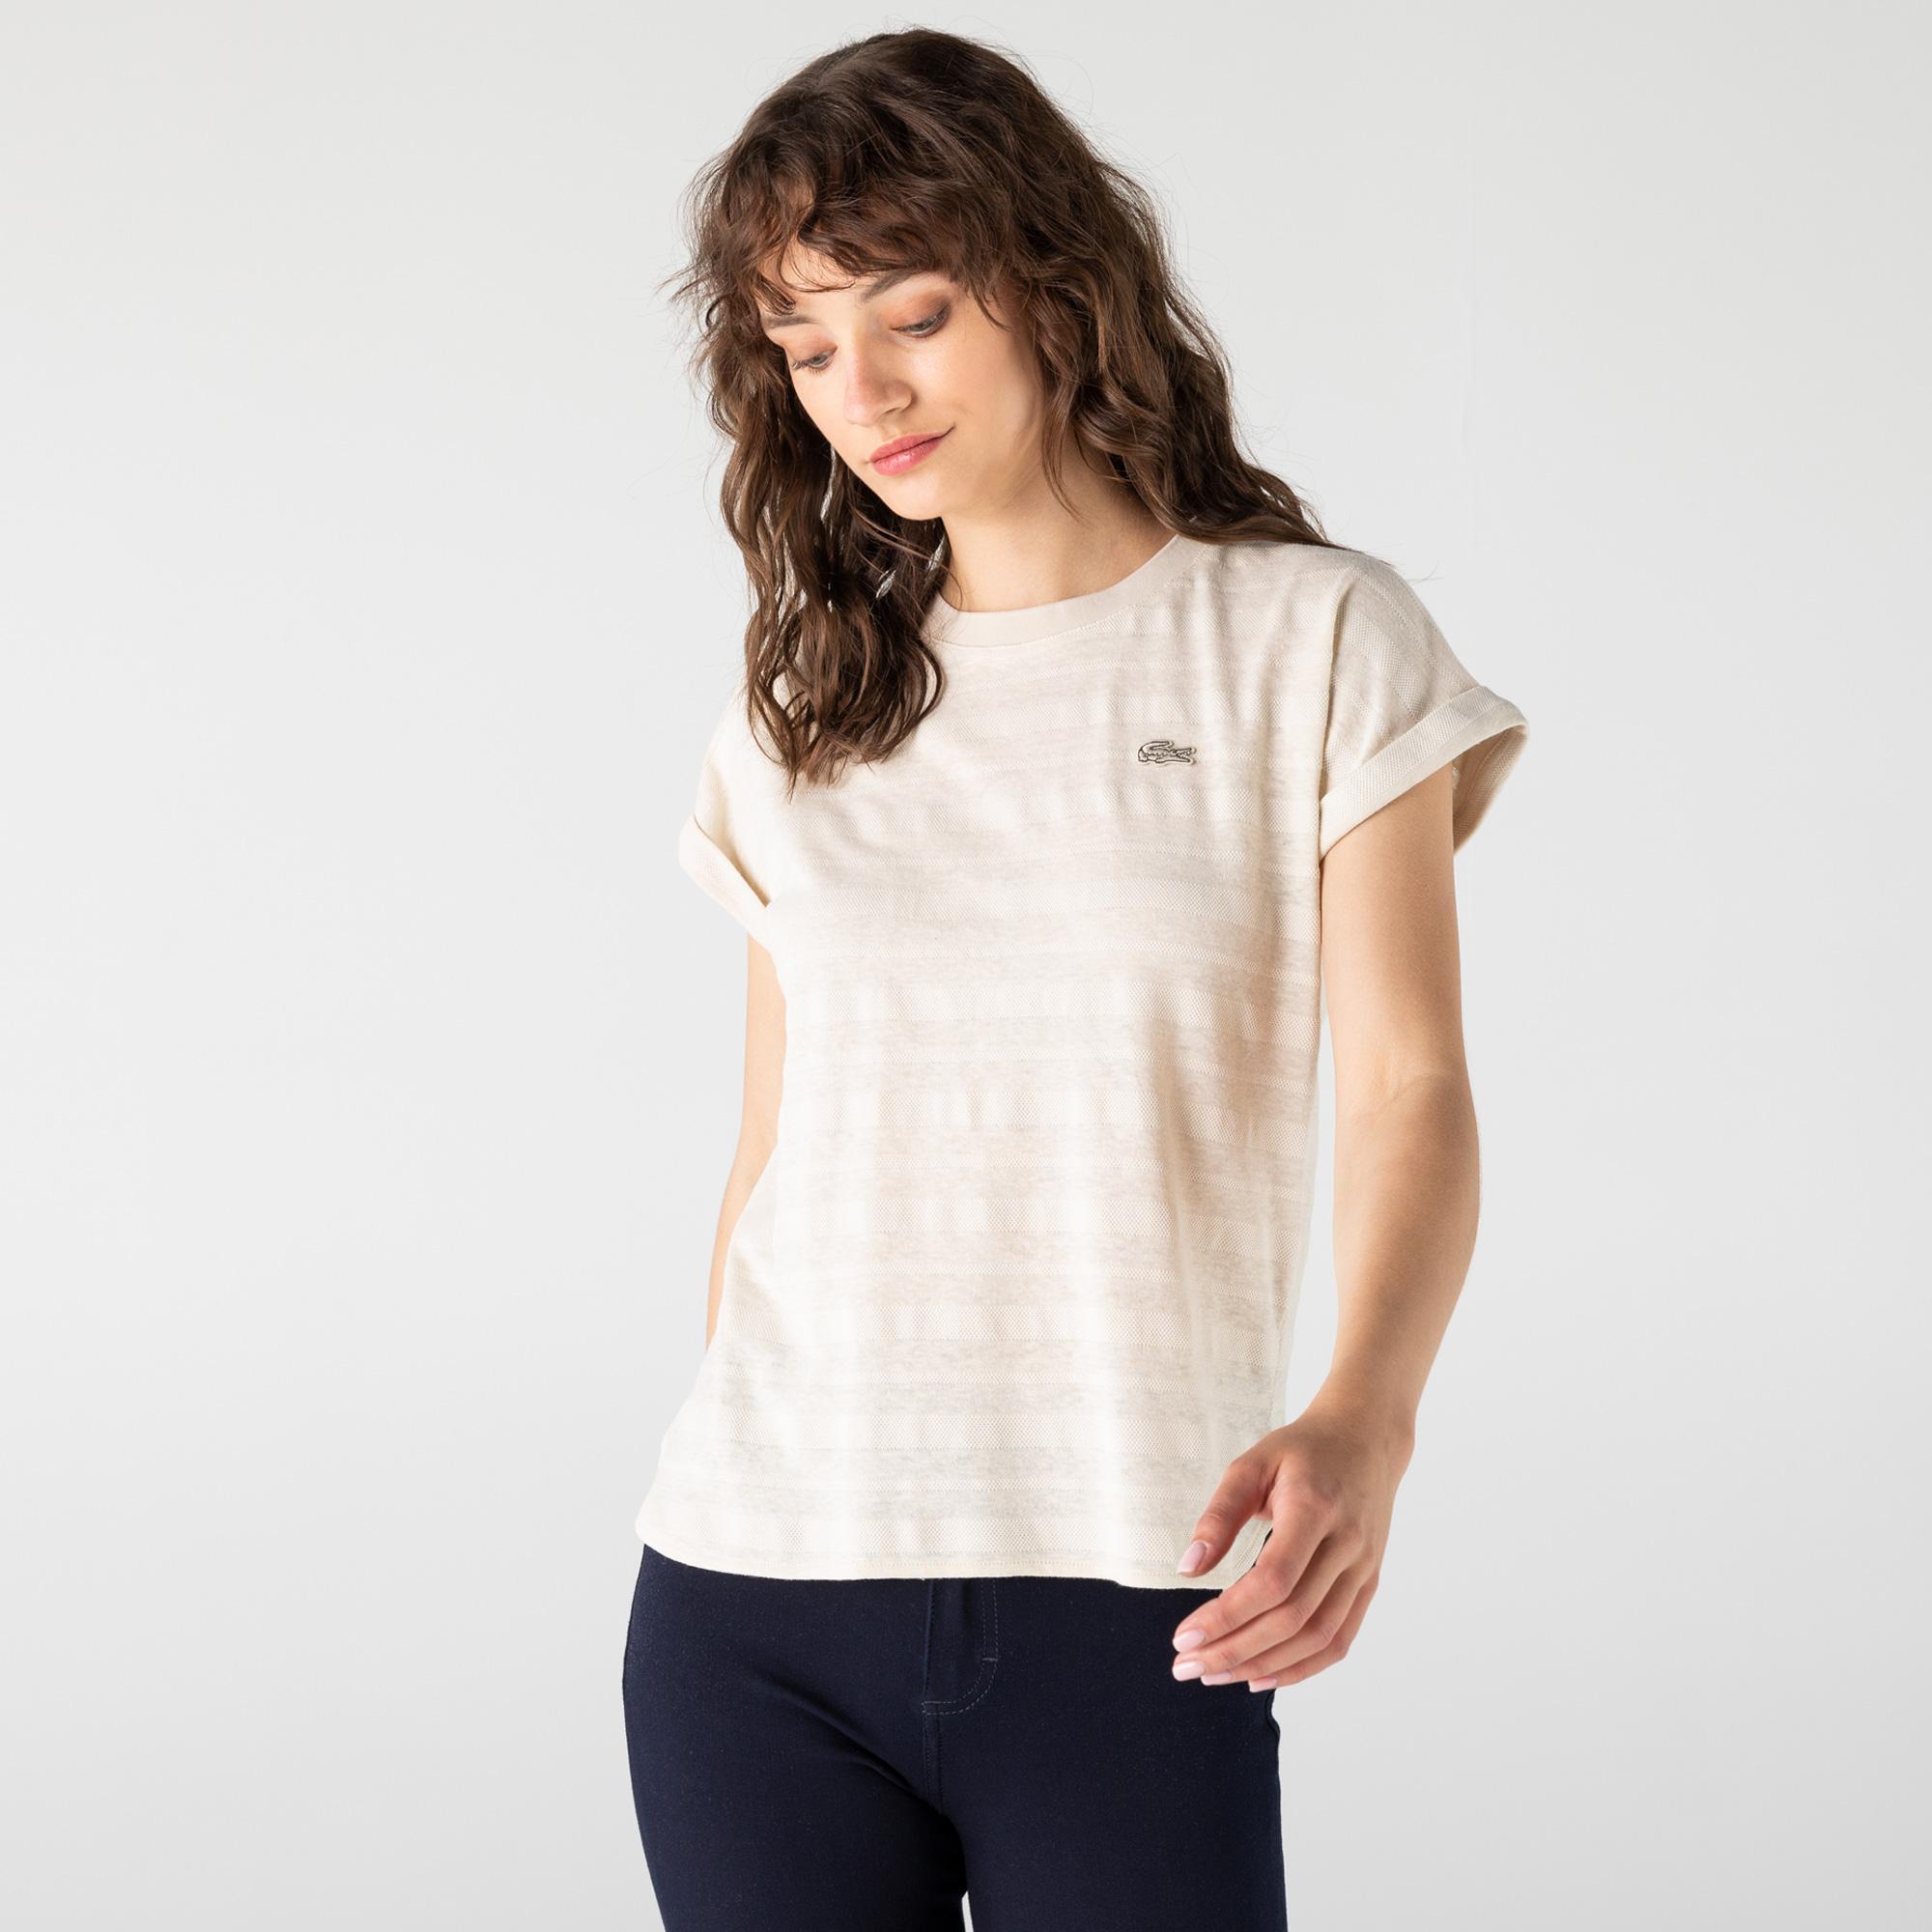 Lacoste Kadın Bisiklet Yaka Bej T-Shirt